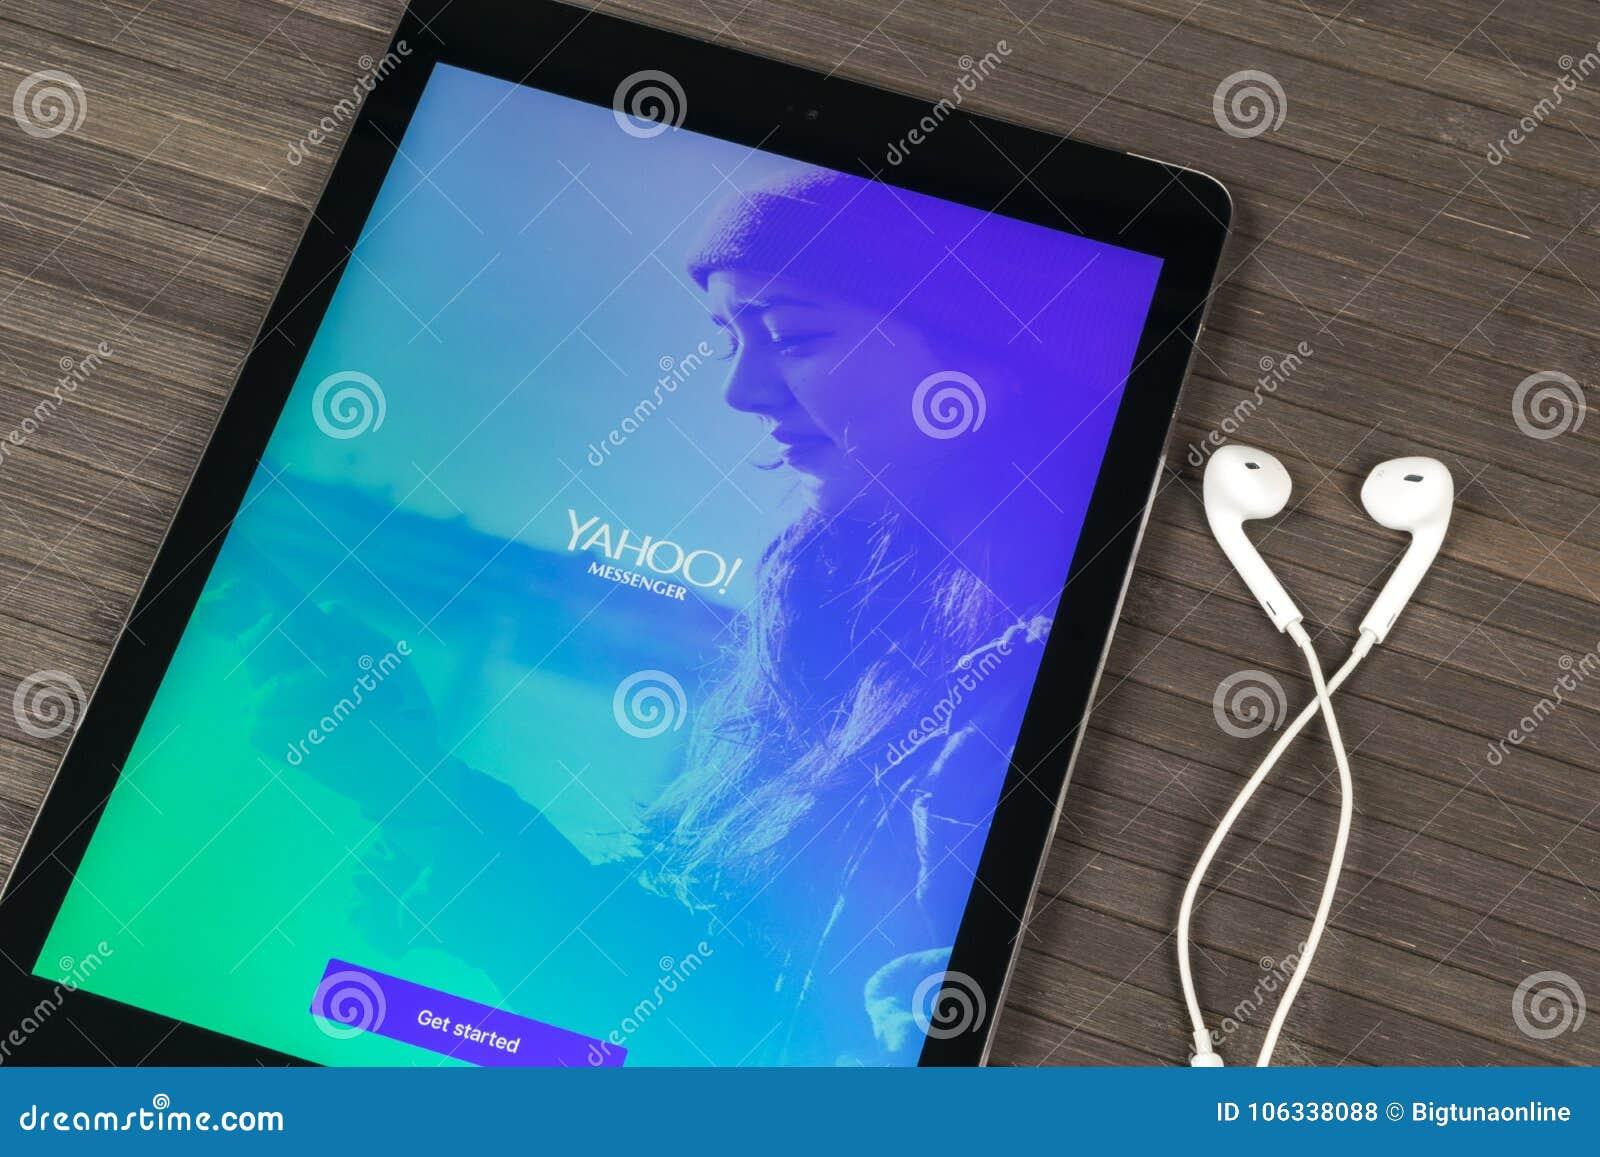 yahoo messeger mobile